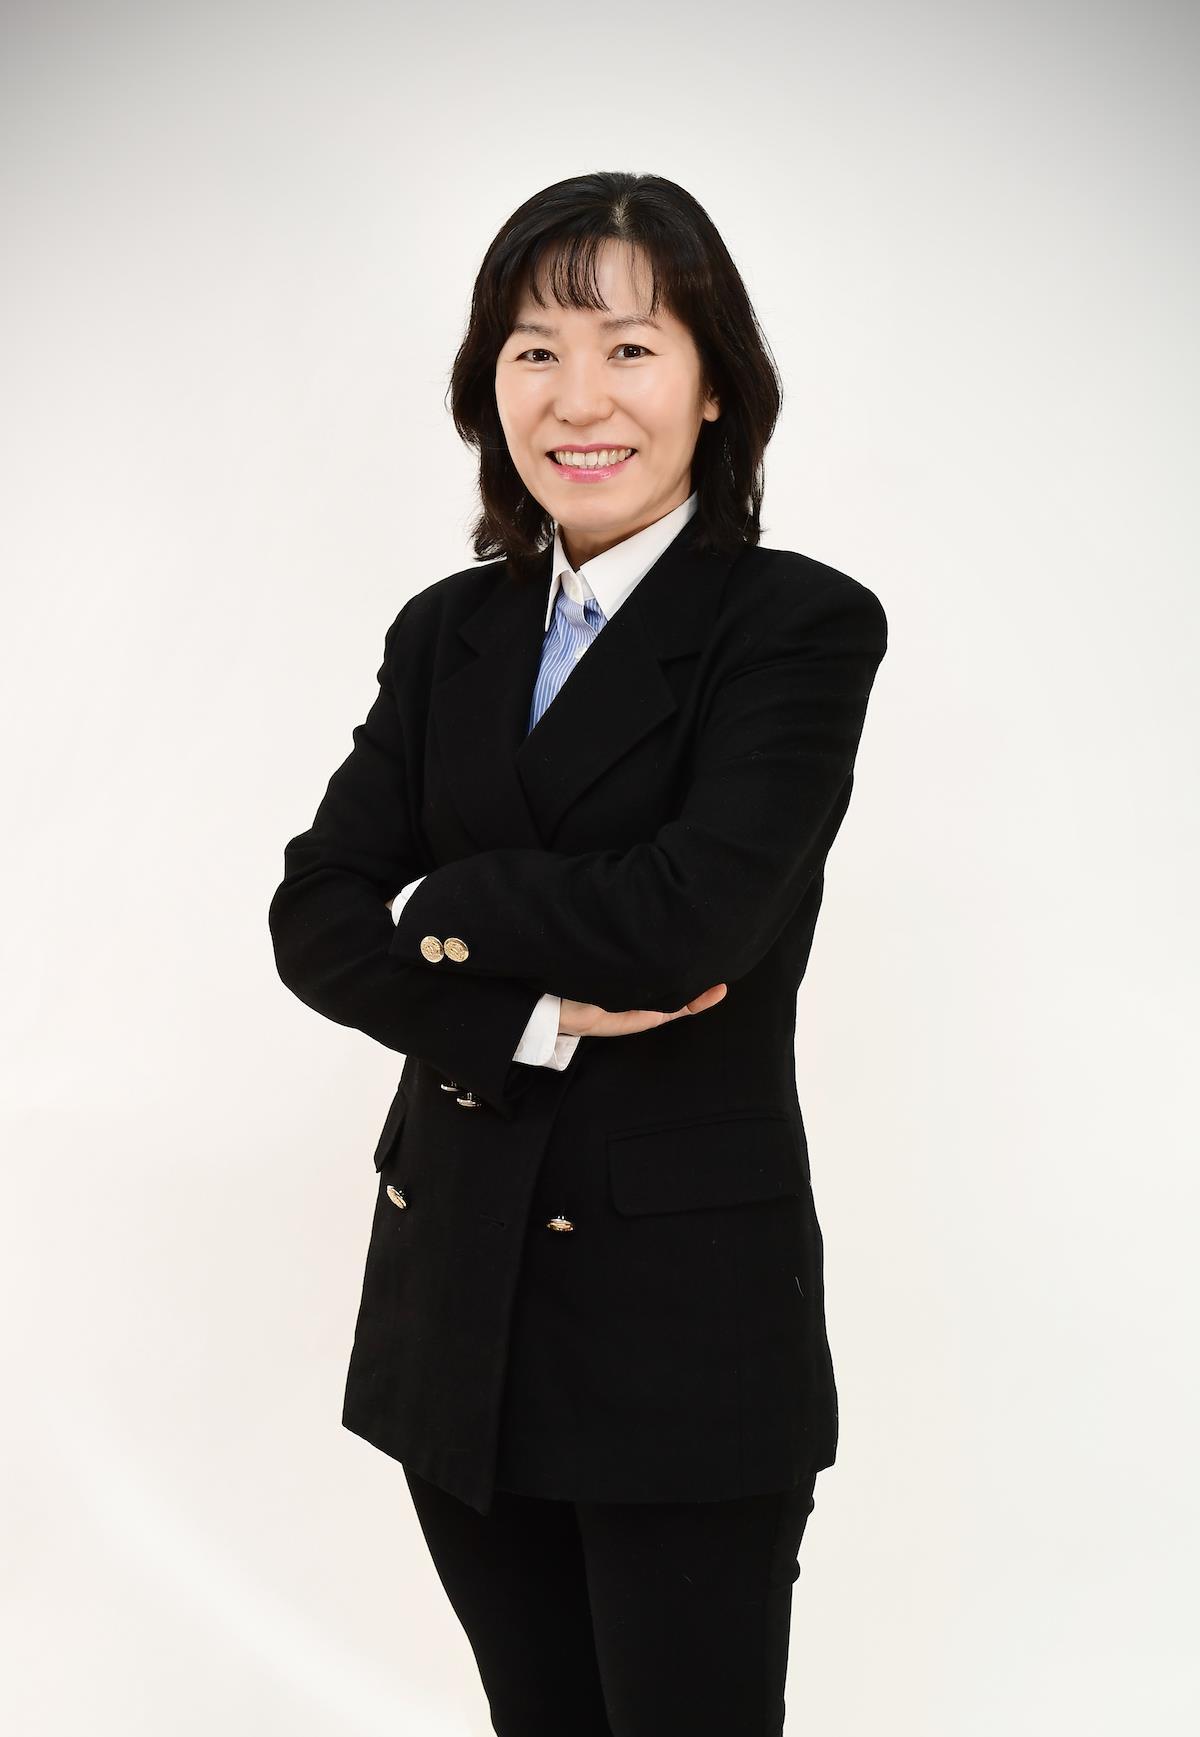 Yoon-Kyoung Kim  ()